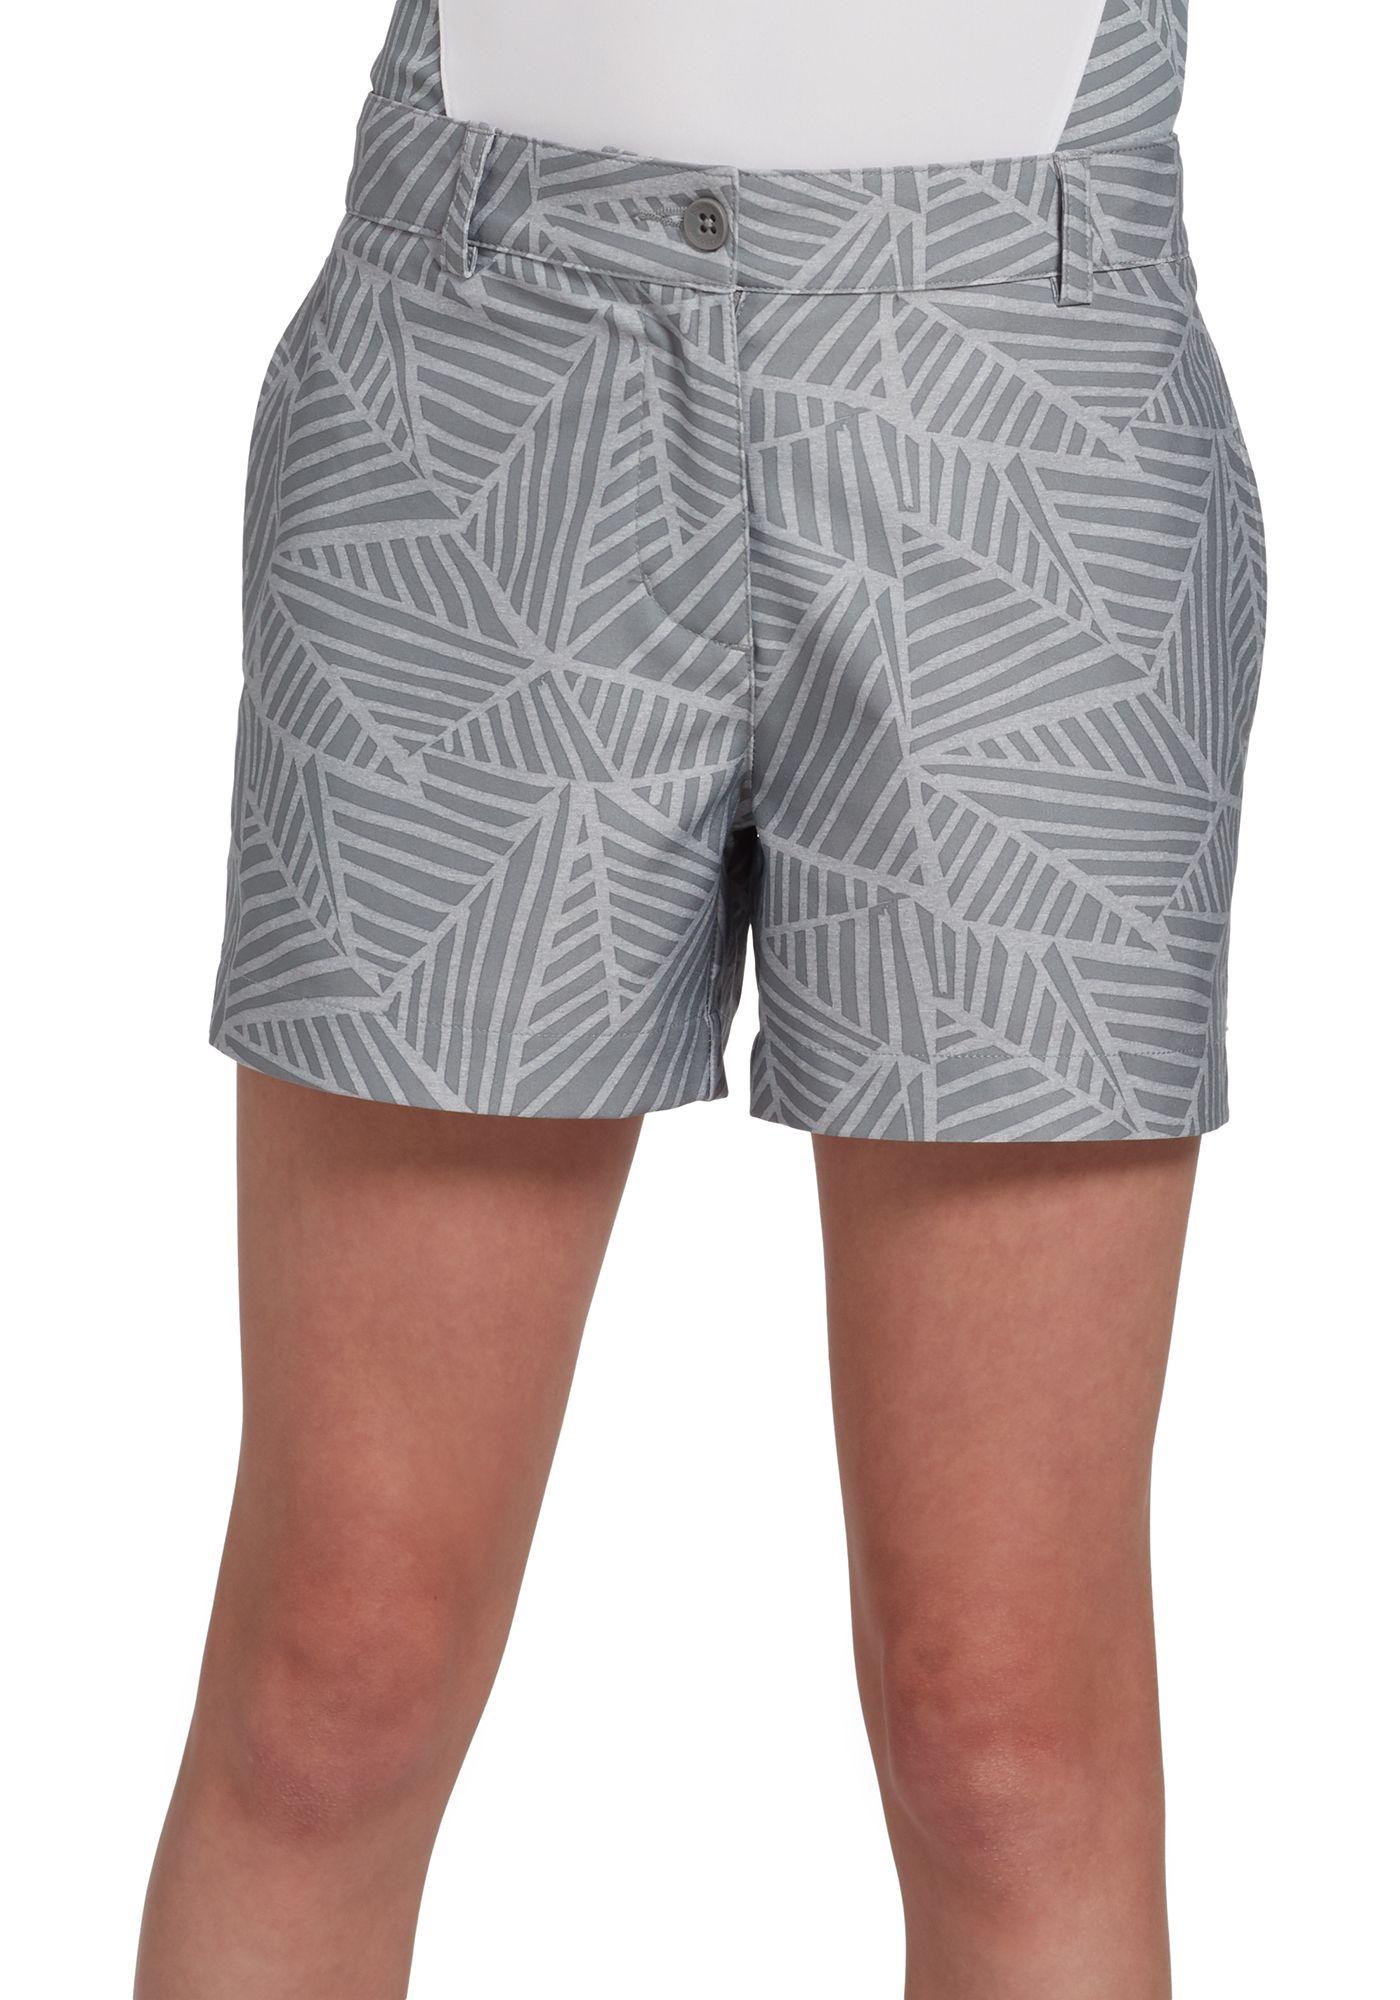 Slazenger Girls' Geo Printed Golf Shorts